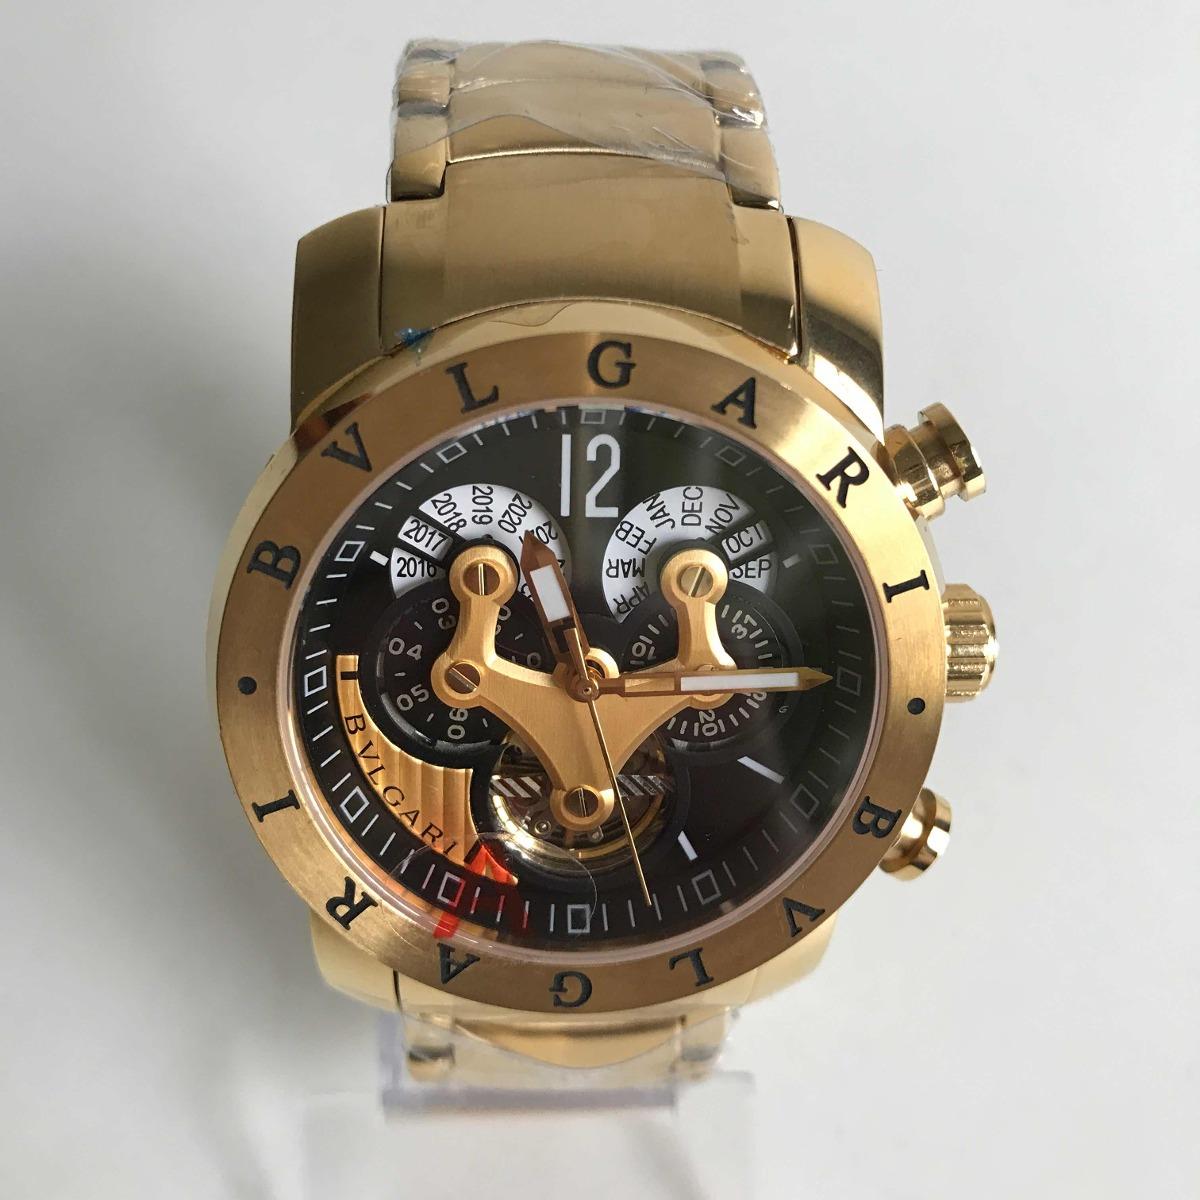 751763783da Relógio Bvlgari Iron Man Dourado